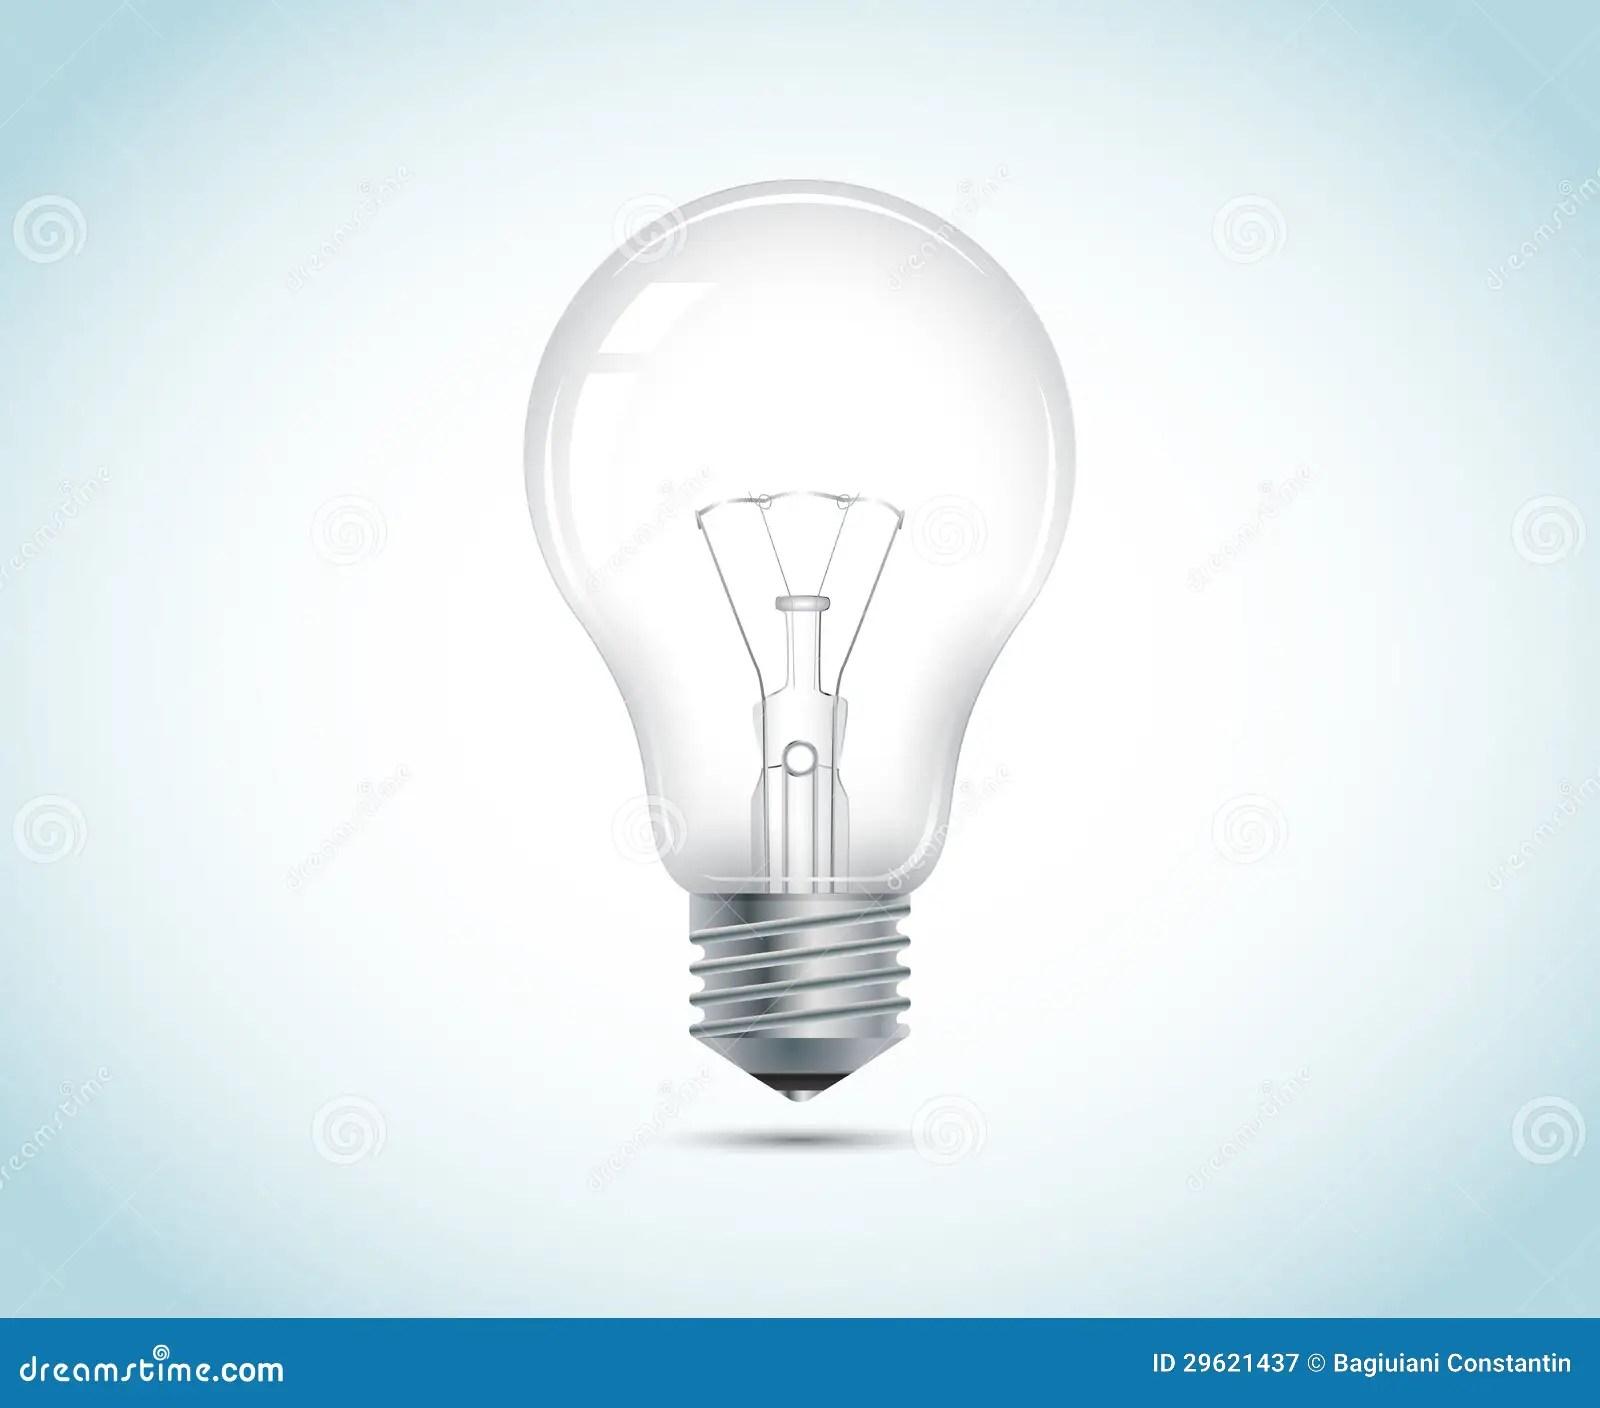 Energy Saving Light Bulb Diagram Energysavinglightbulbdiagram